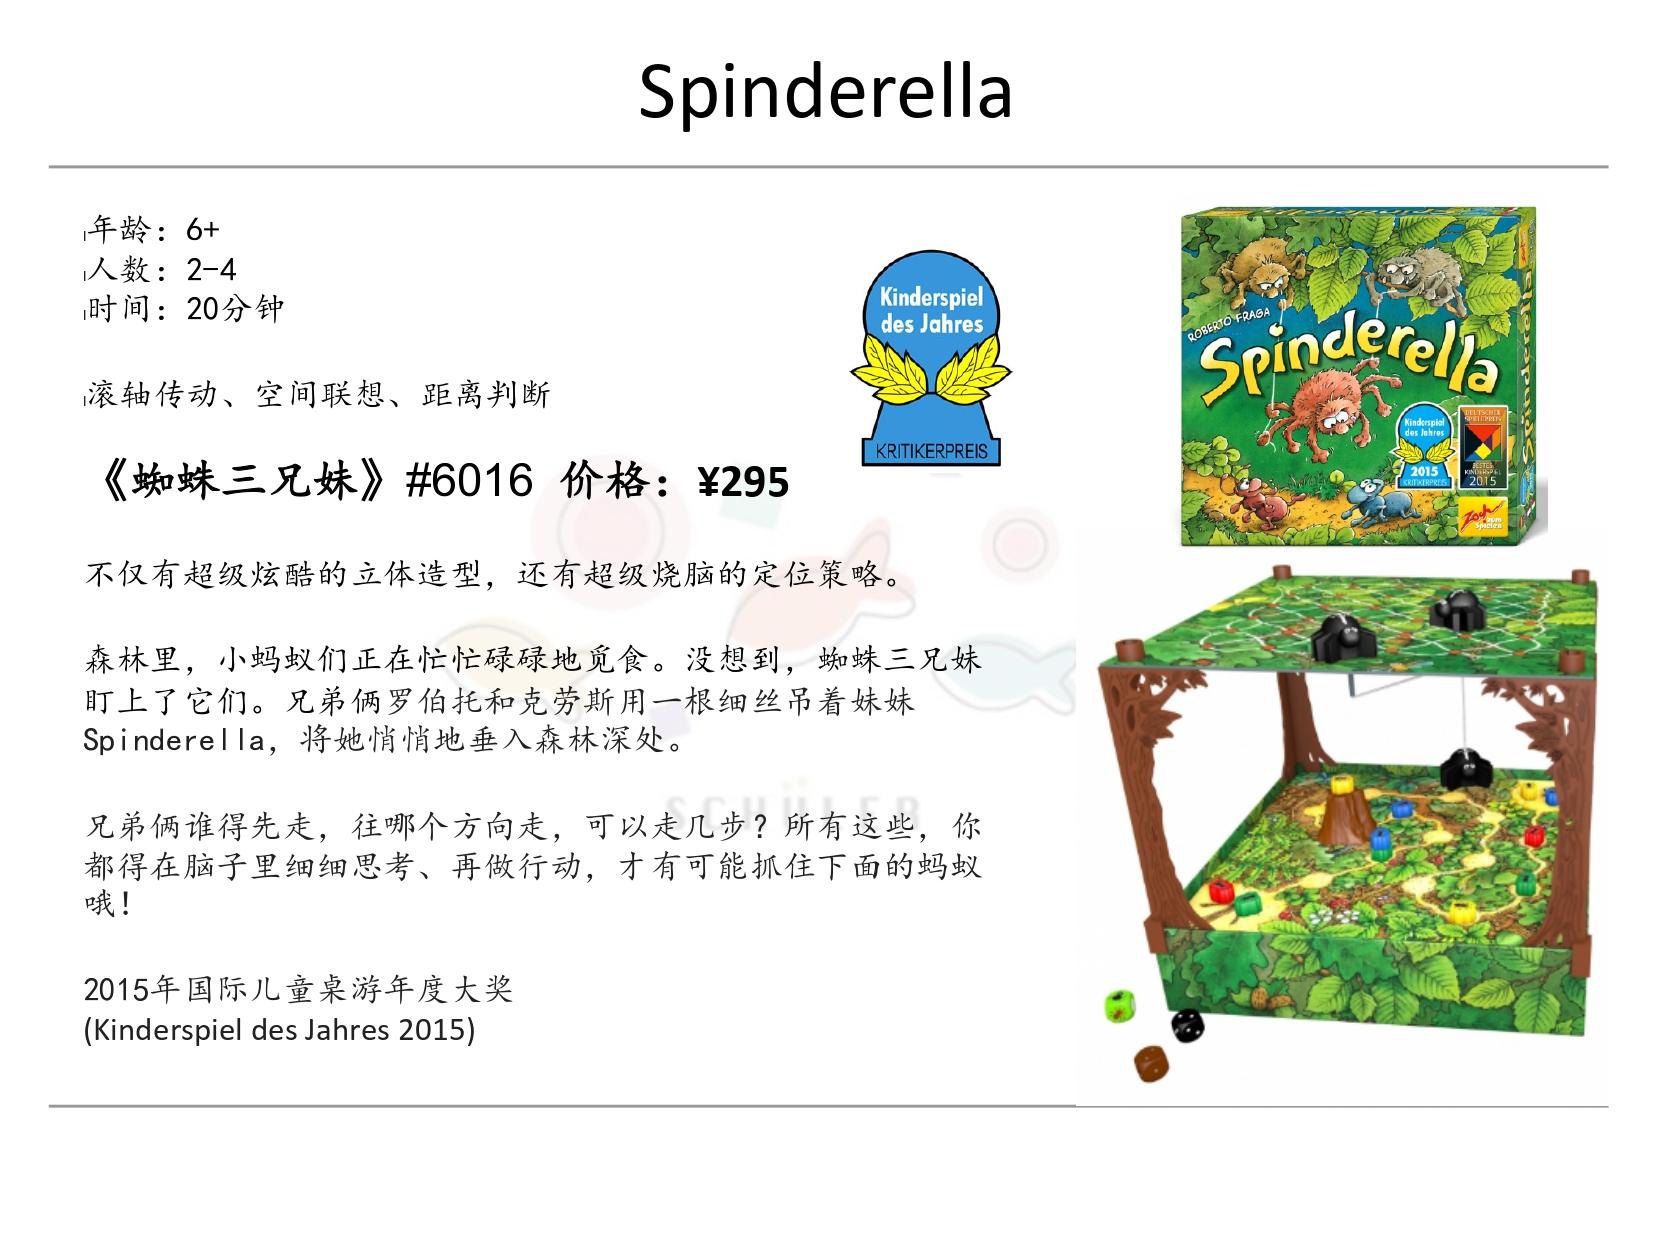 Spinderella 蜘蛛三兄妹